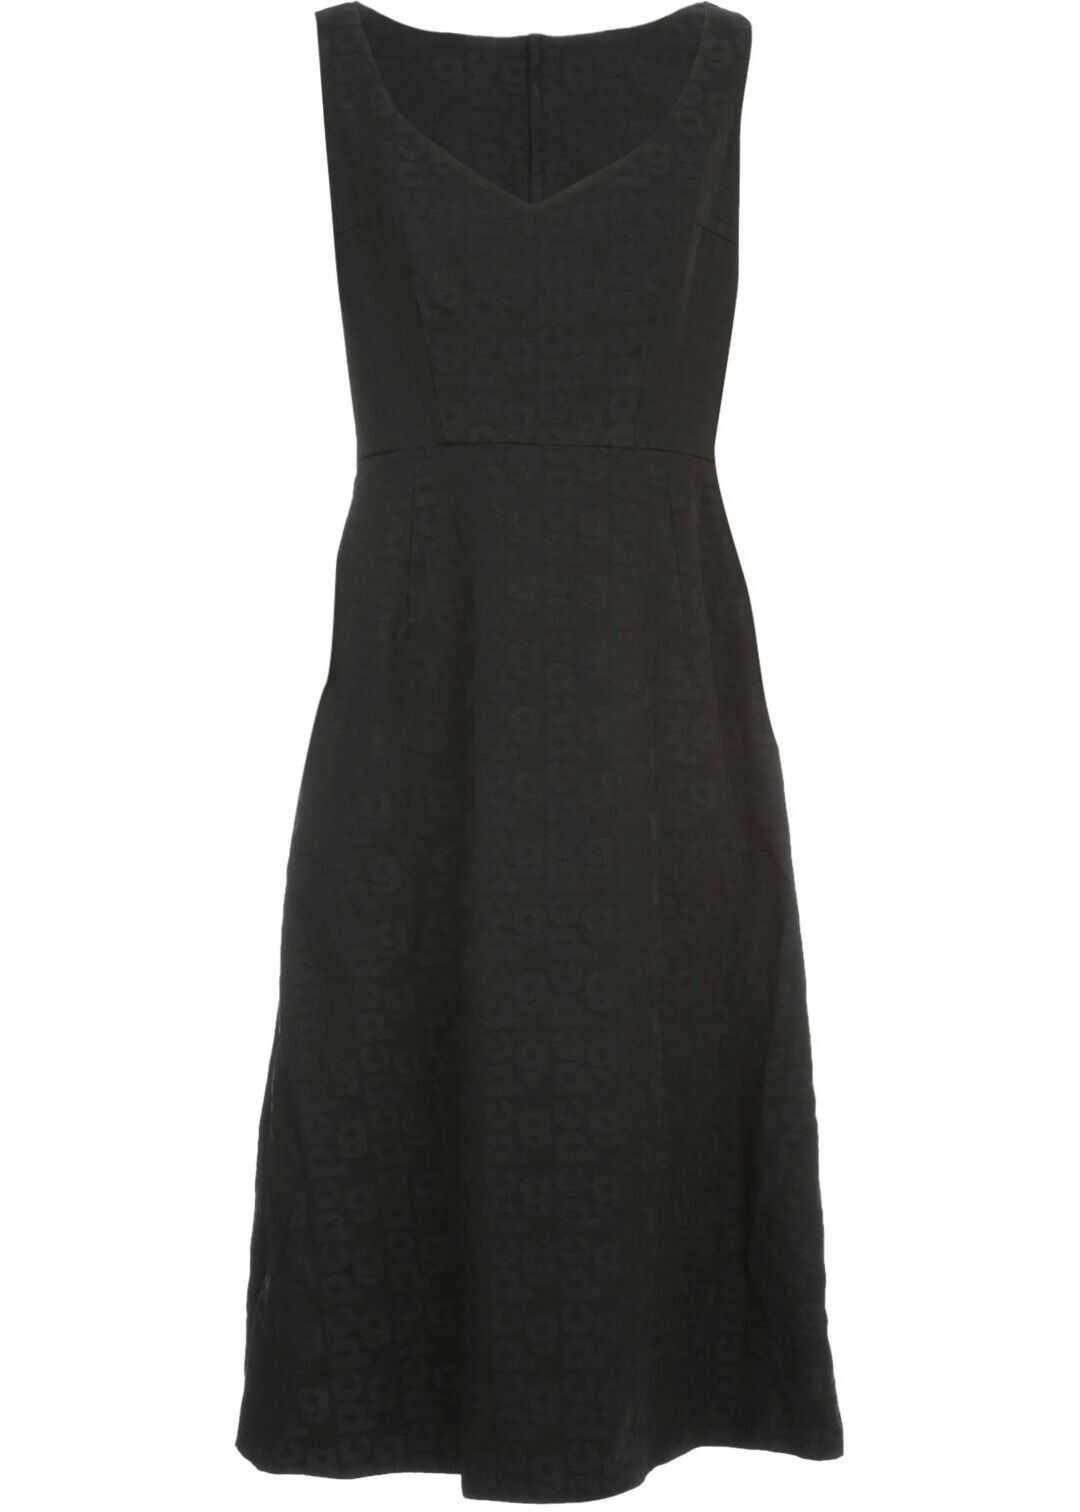 Comme des Garçons Polyester Dress BLACK